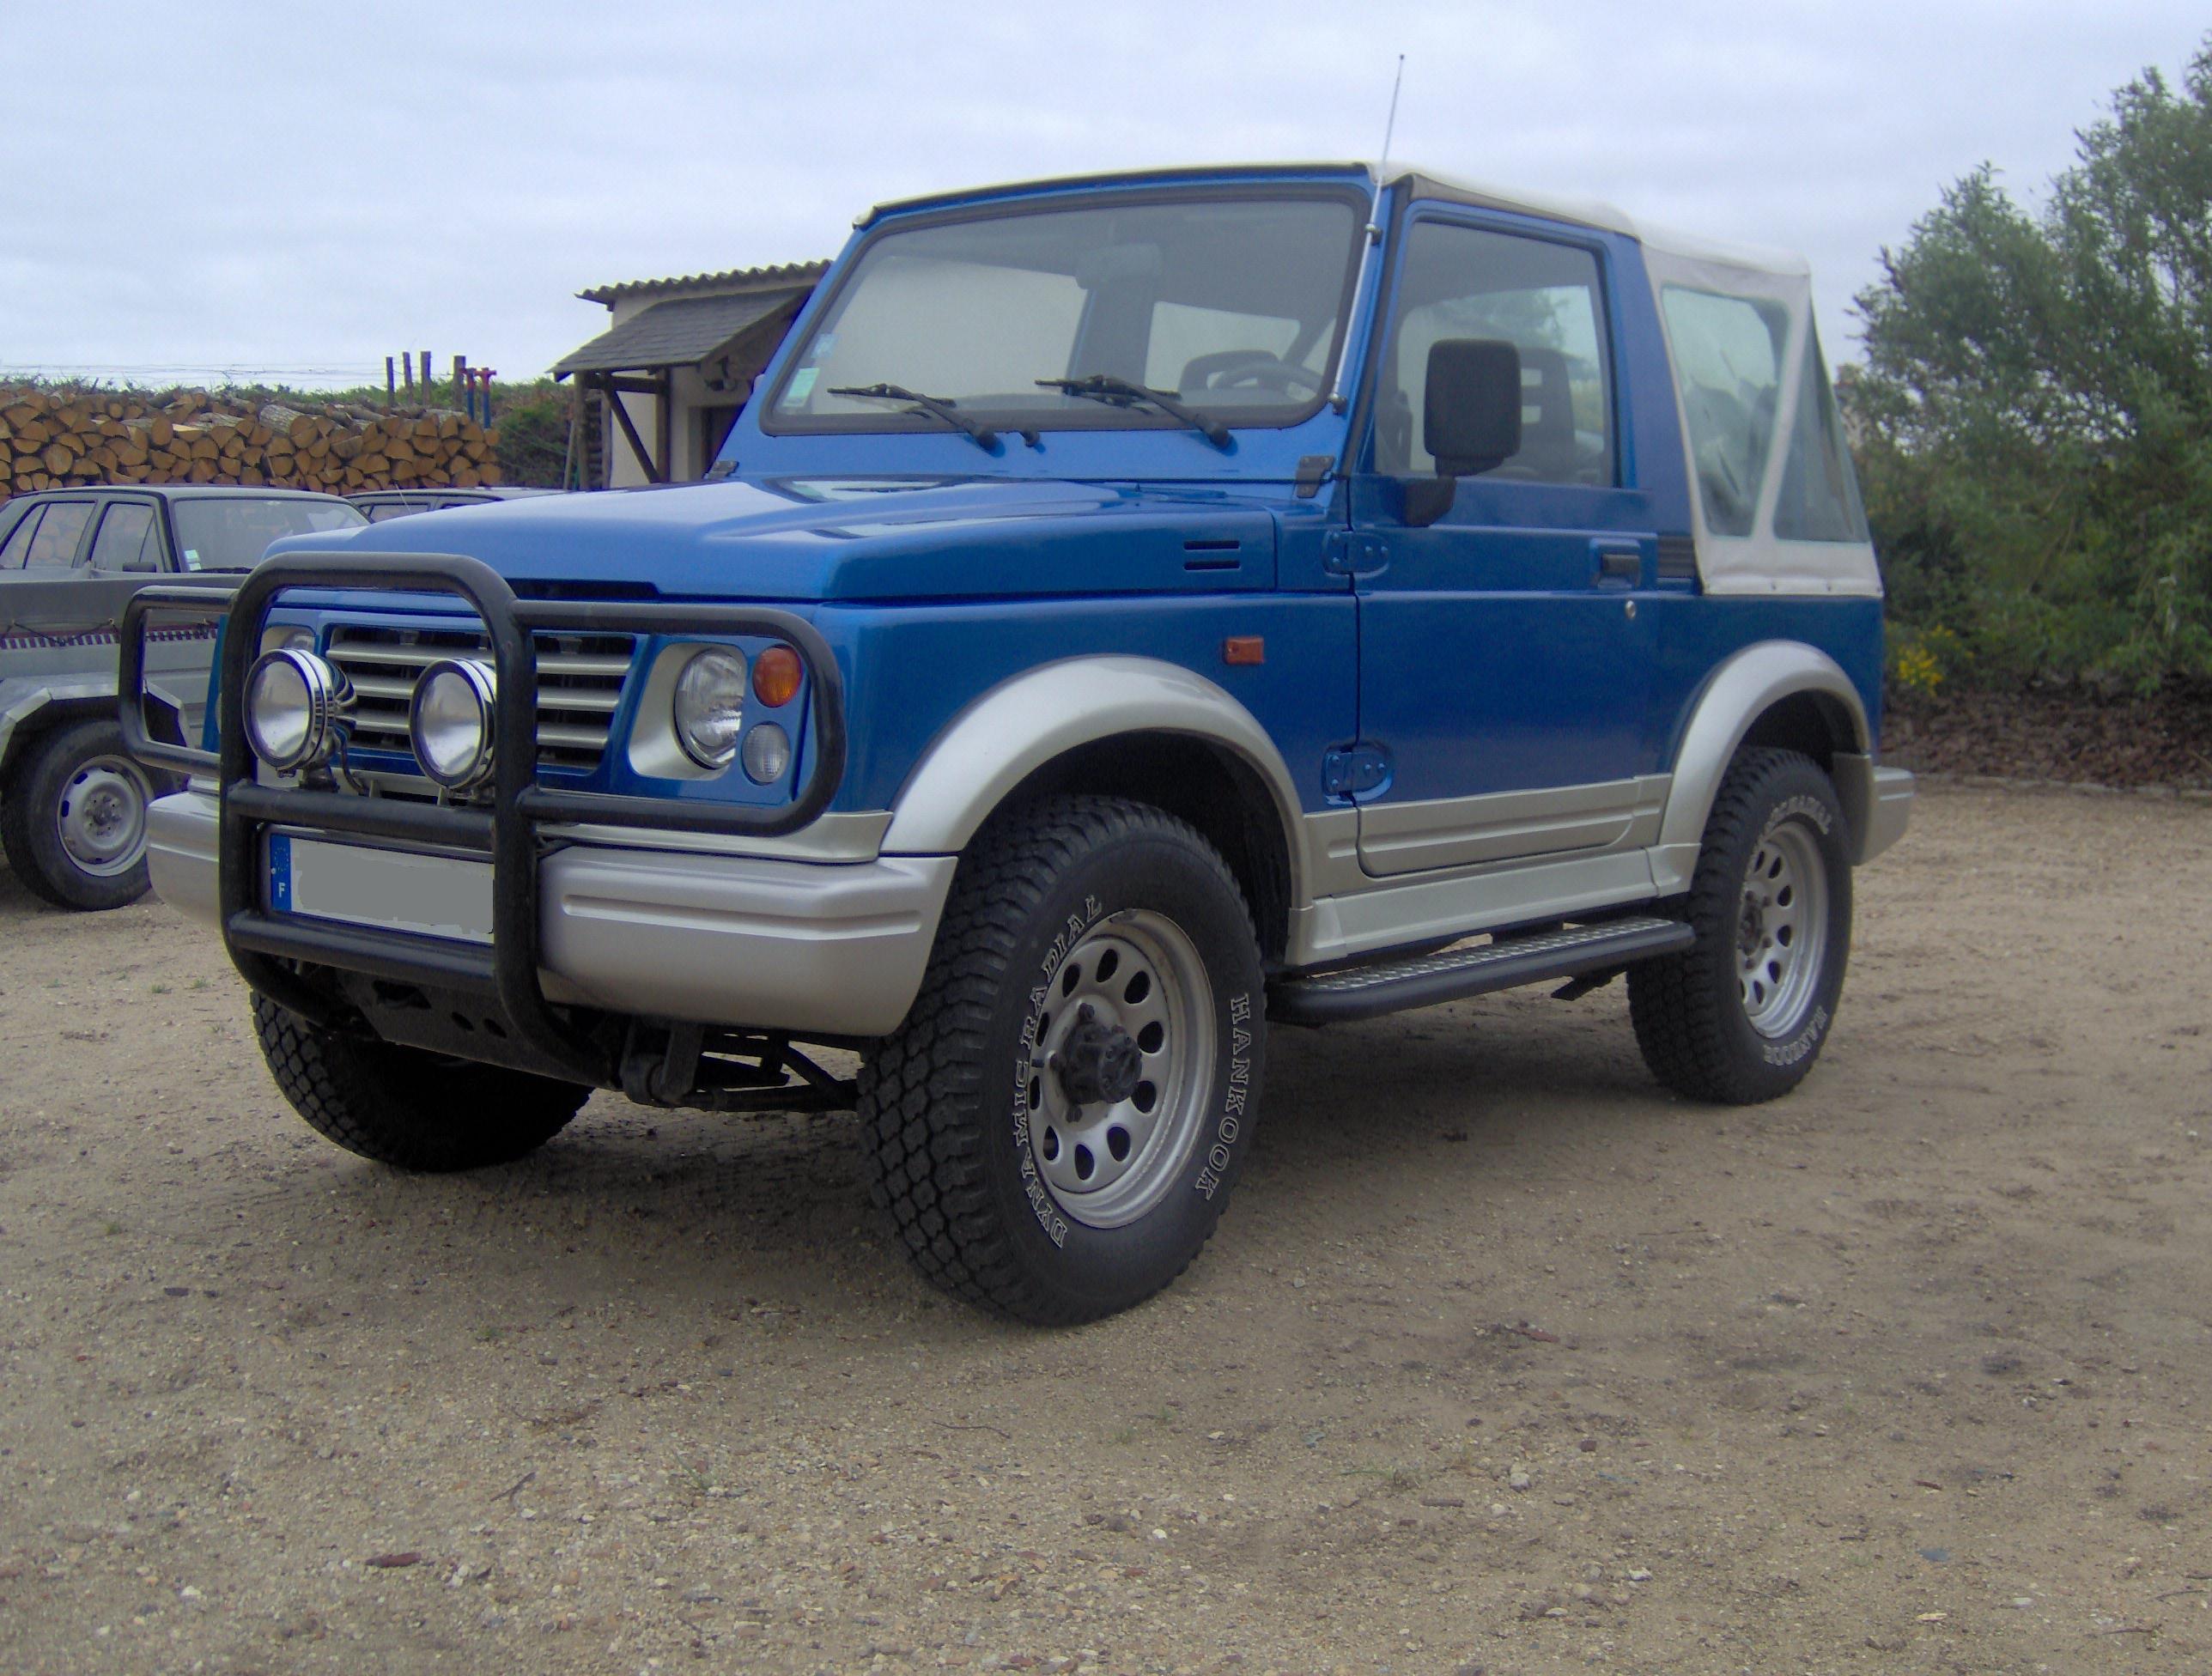 1999 Suzuki Samurai - Partsopen